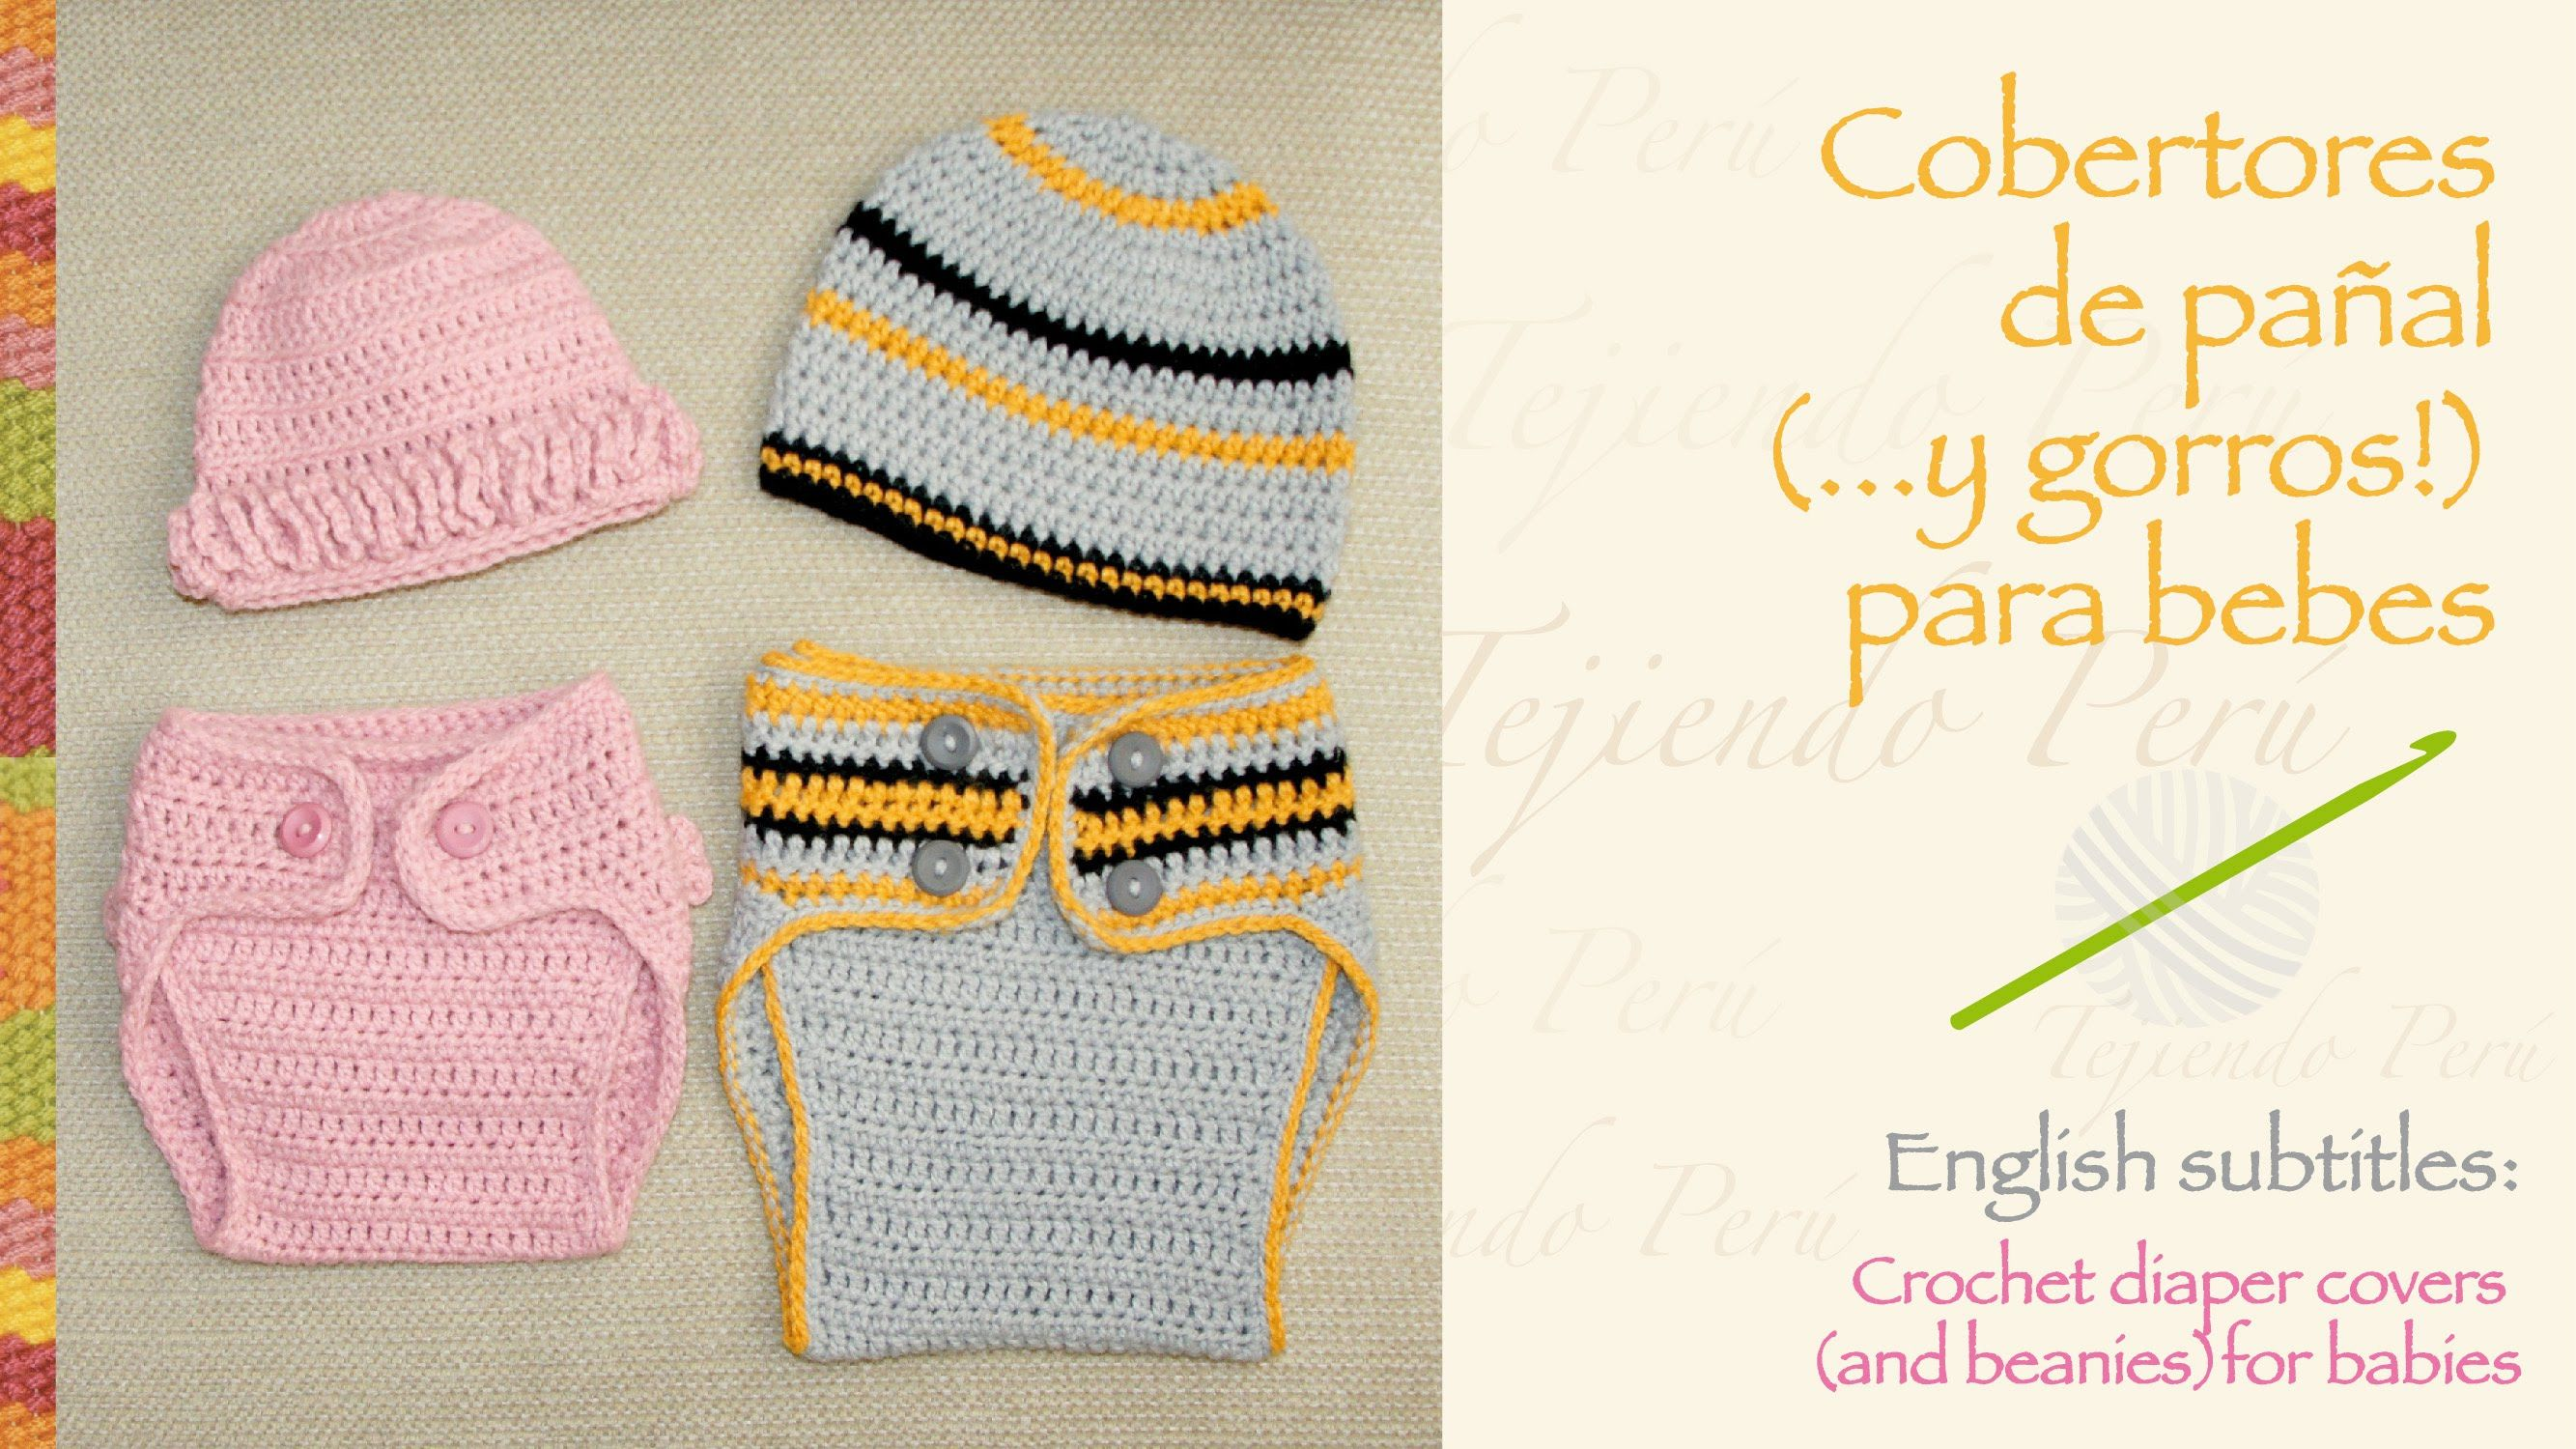 Hermosa Crochet Patrón De Pañal Cubierta 12 Meses Imagen - Ideas de ...